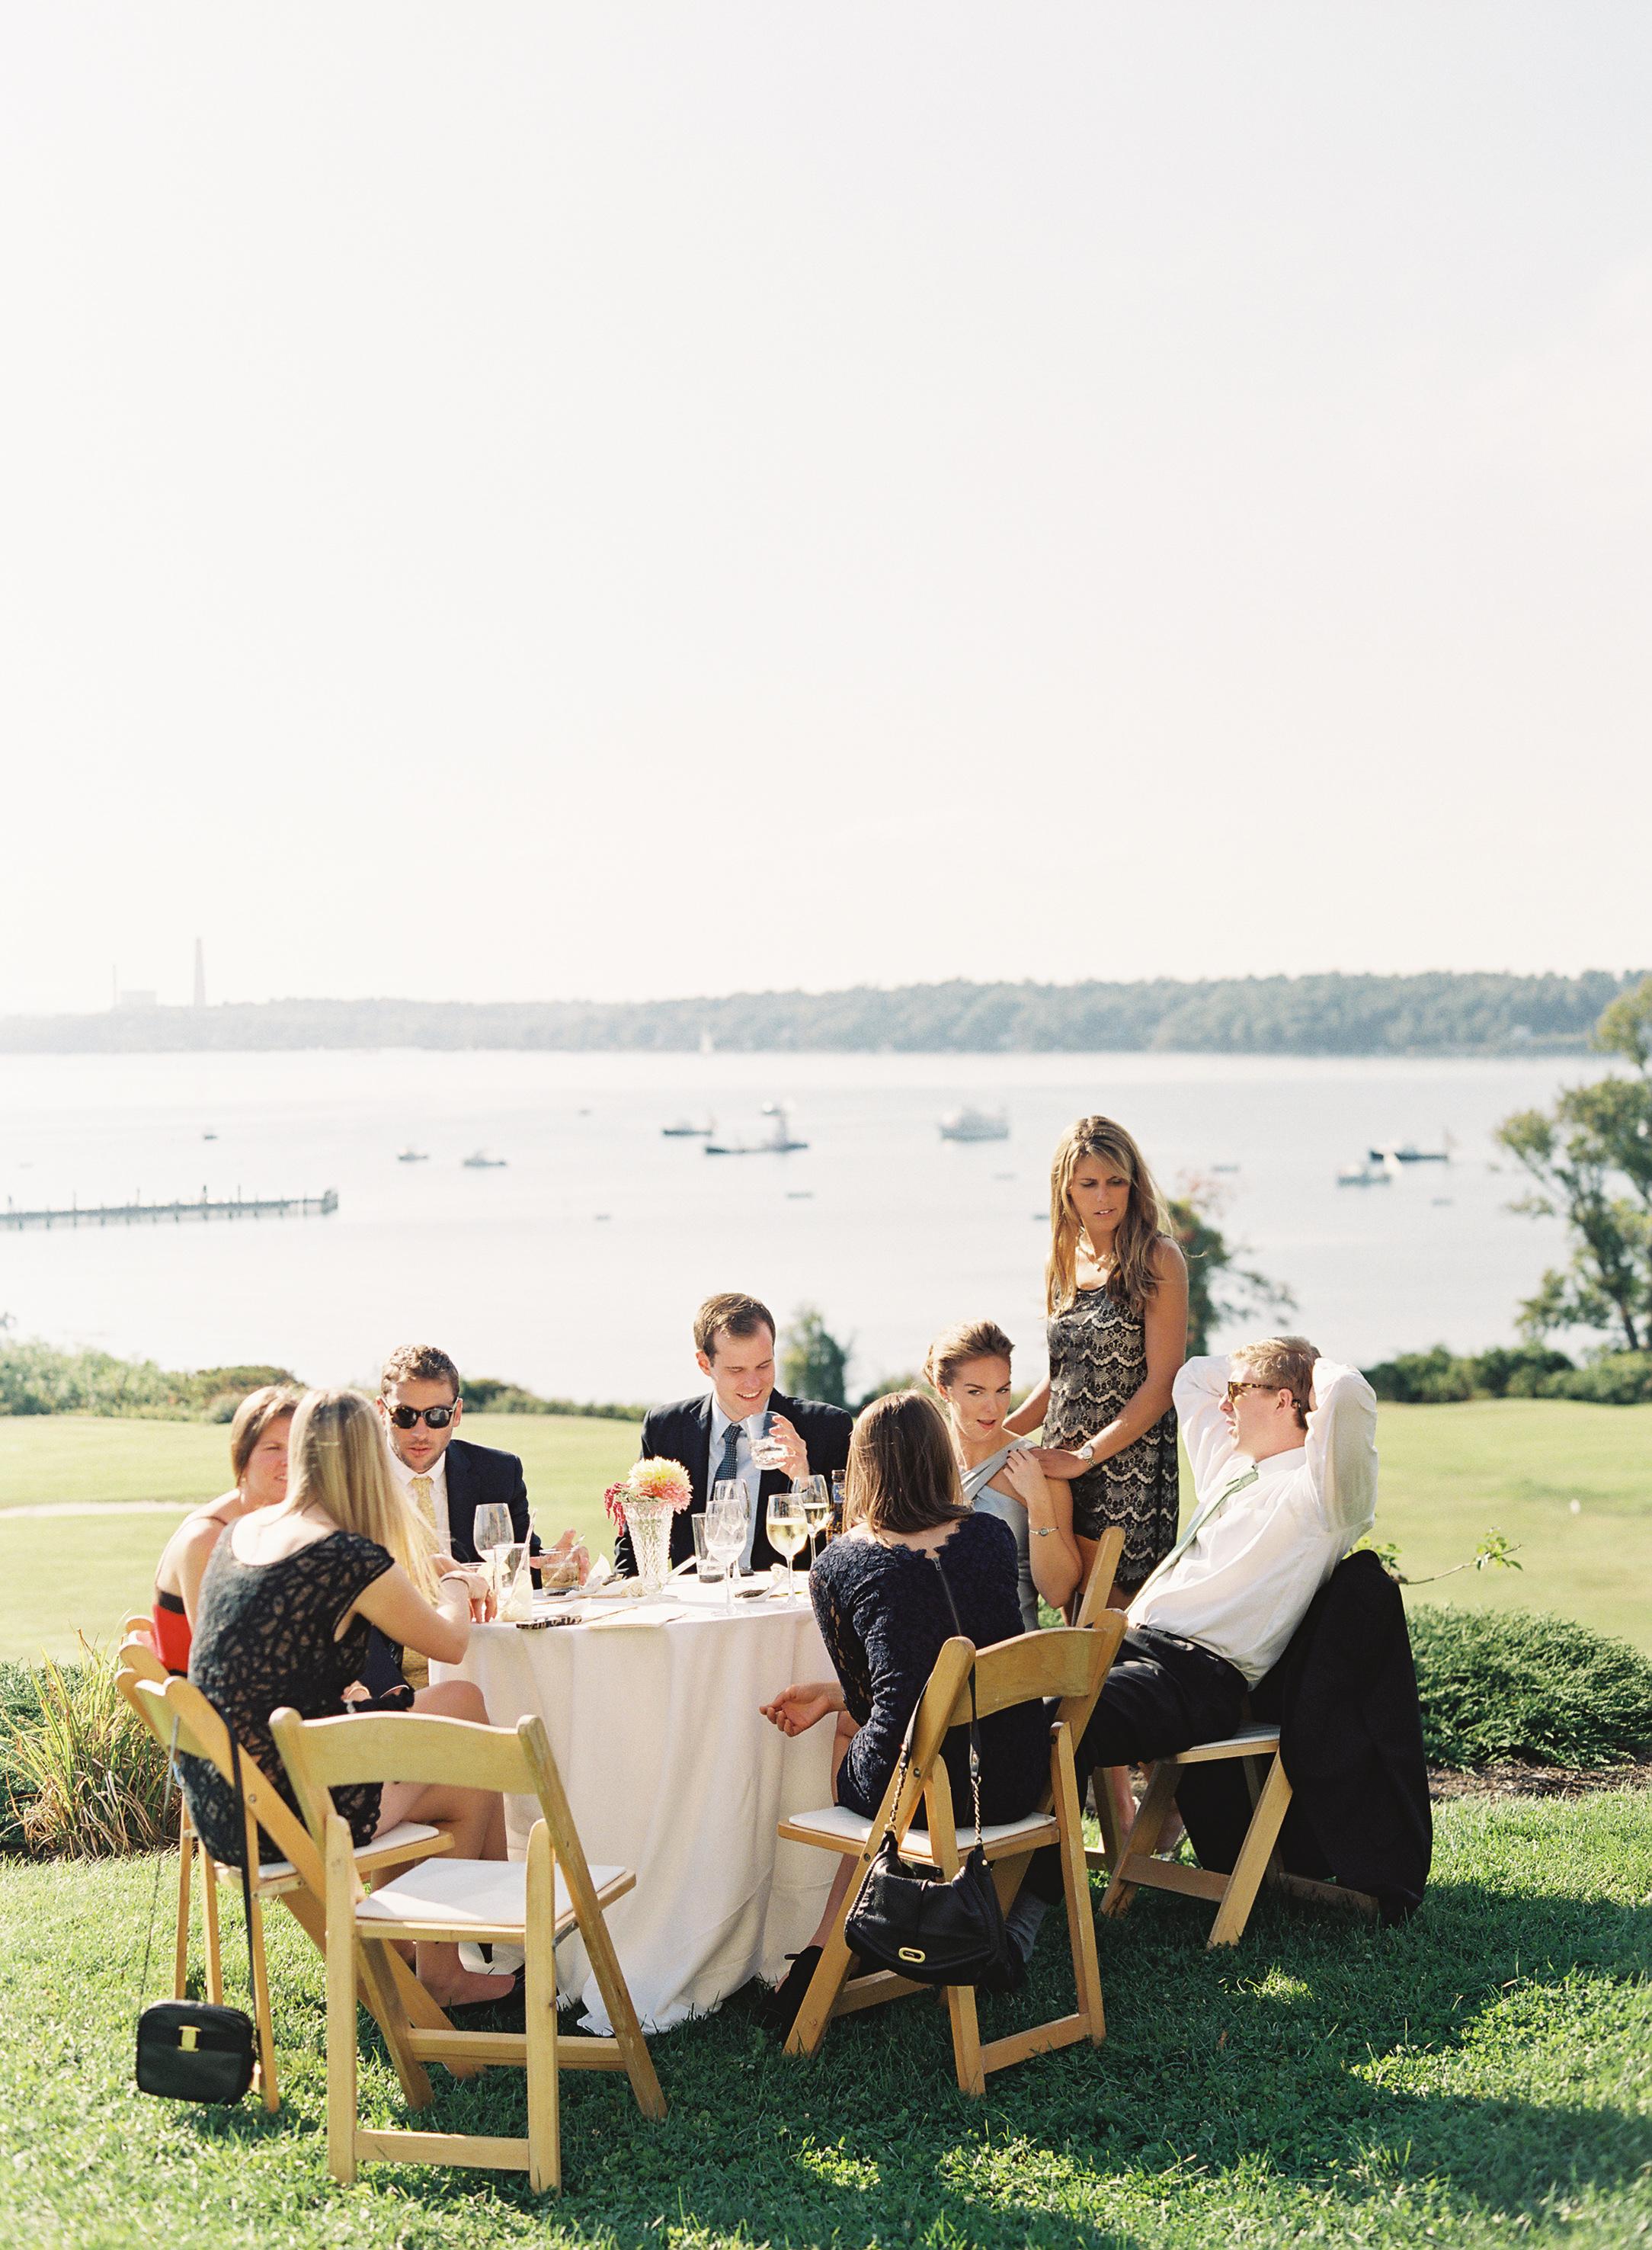 chebeague_island_inn_wedding_gabe_aceves028.JPG